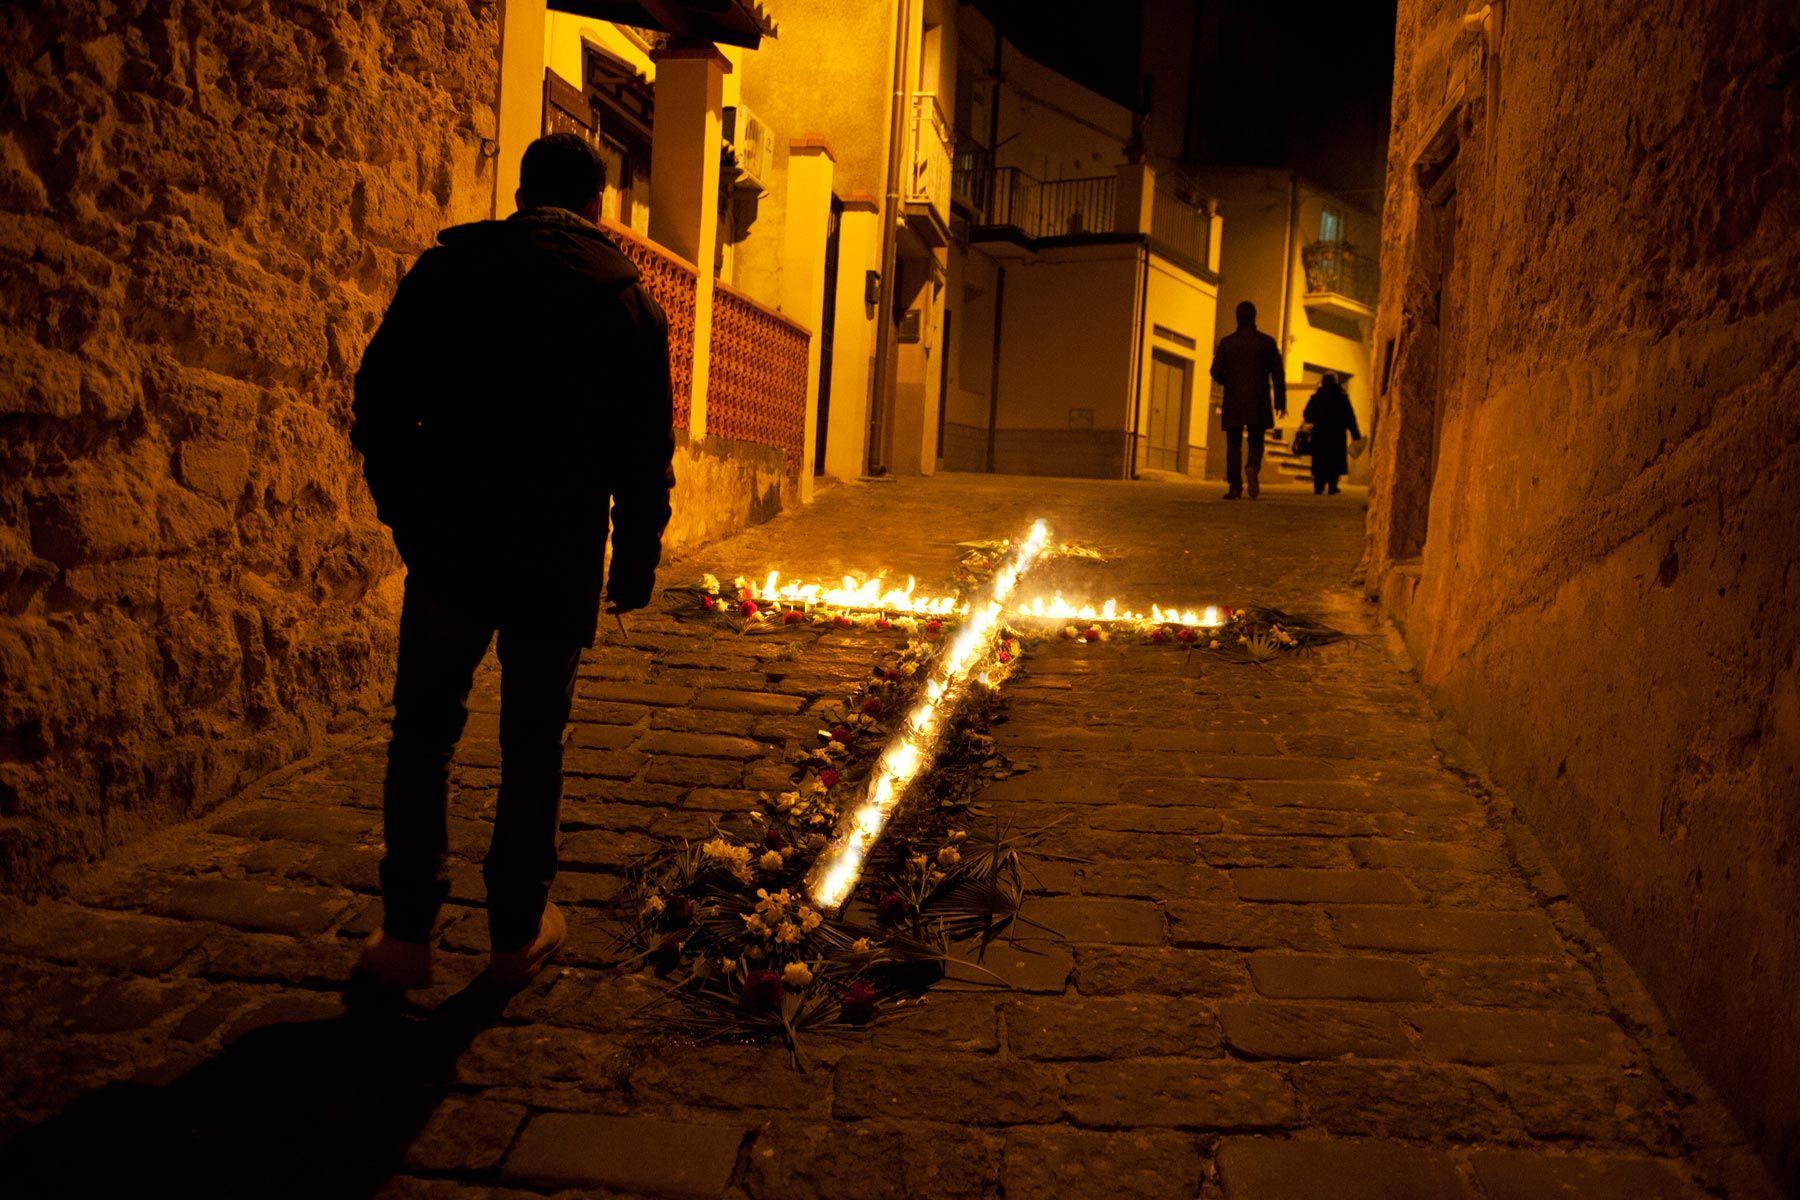 After Dark | Steve McCurry